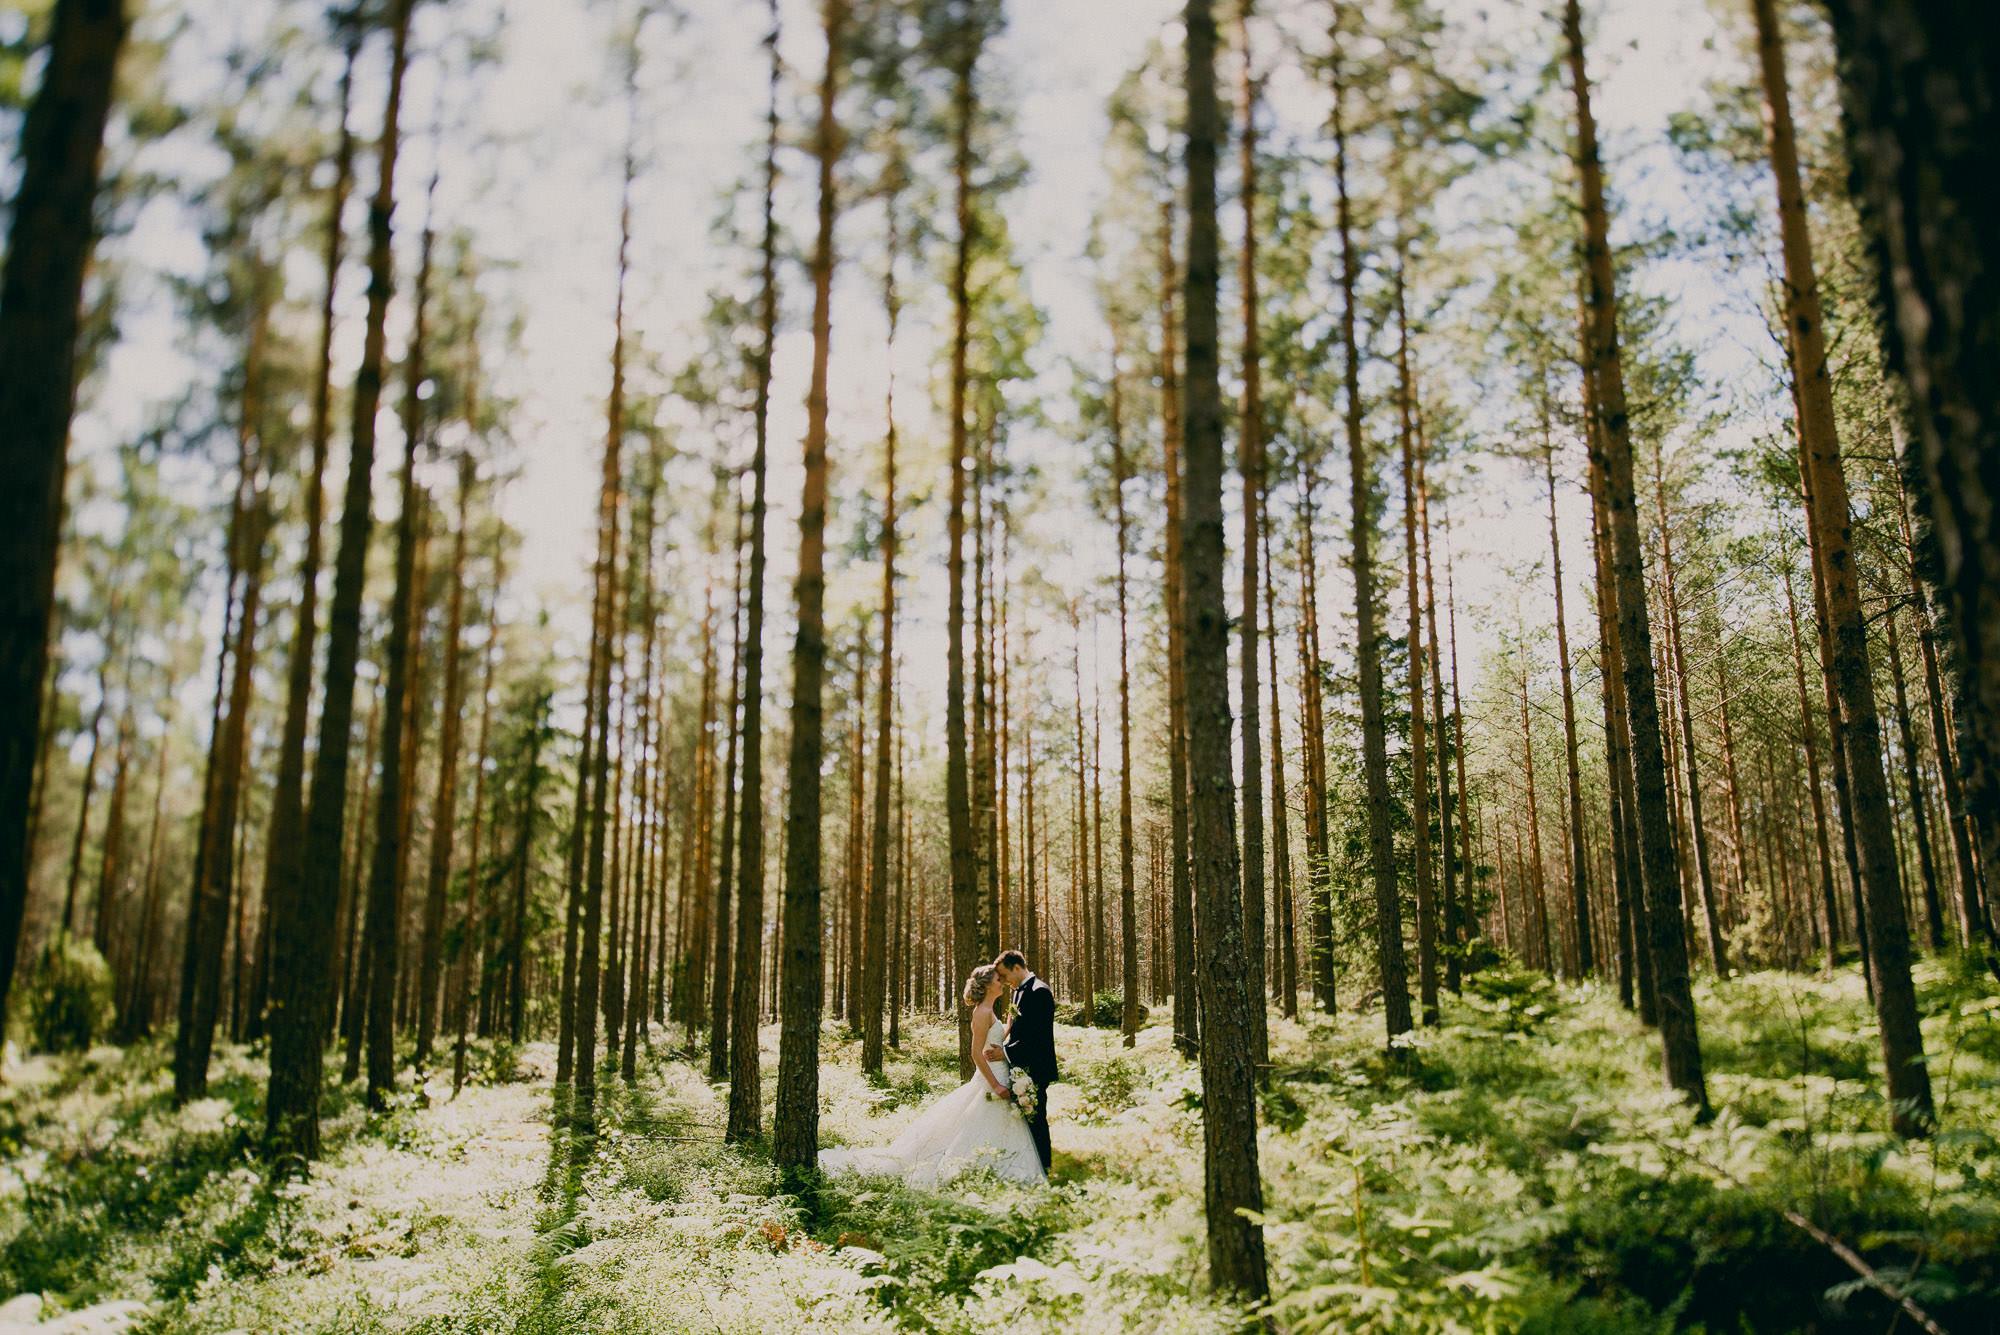 rabbit_visuals_haavideo_wedding_videography_el-011.jpg